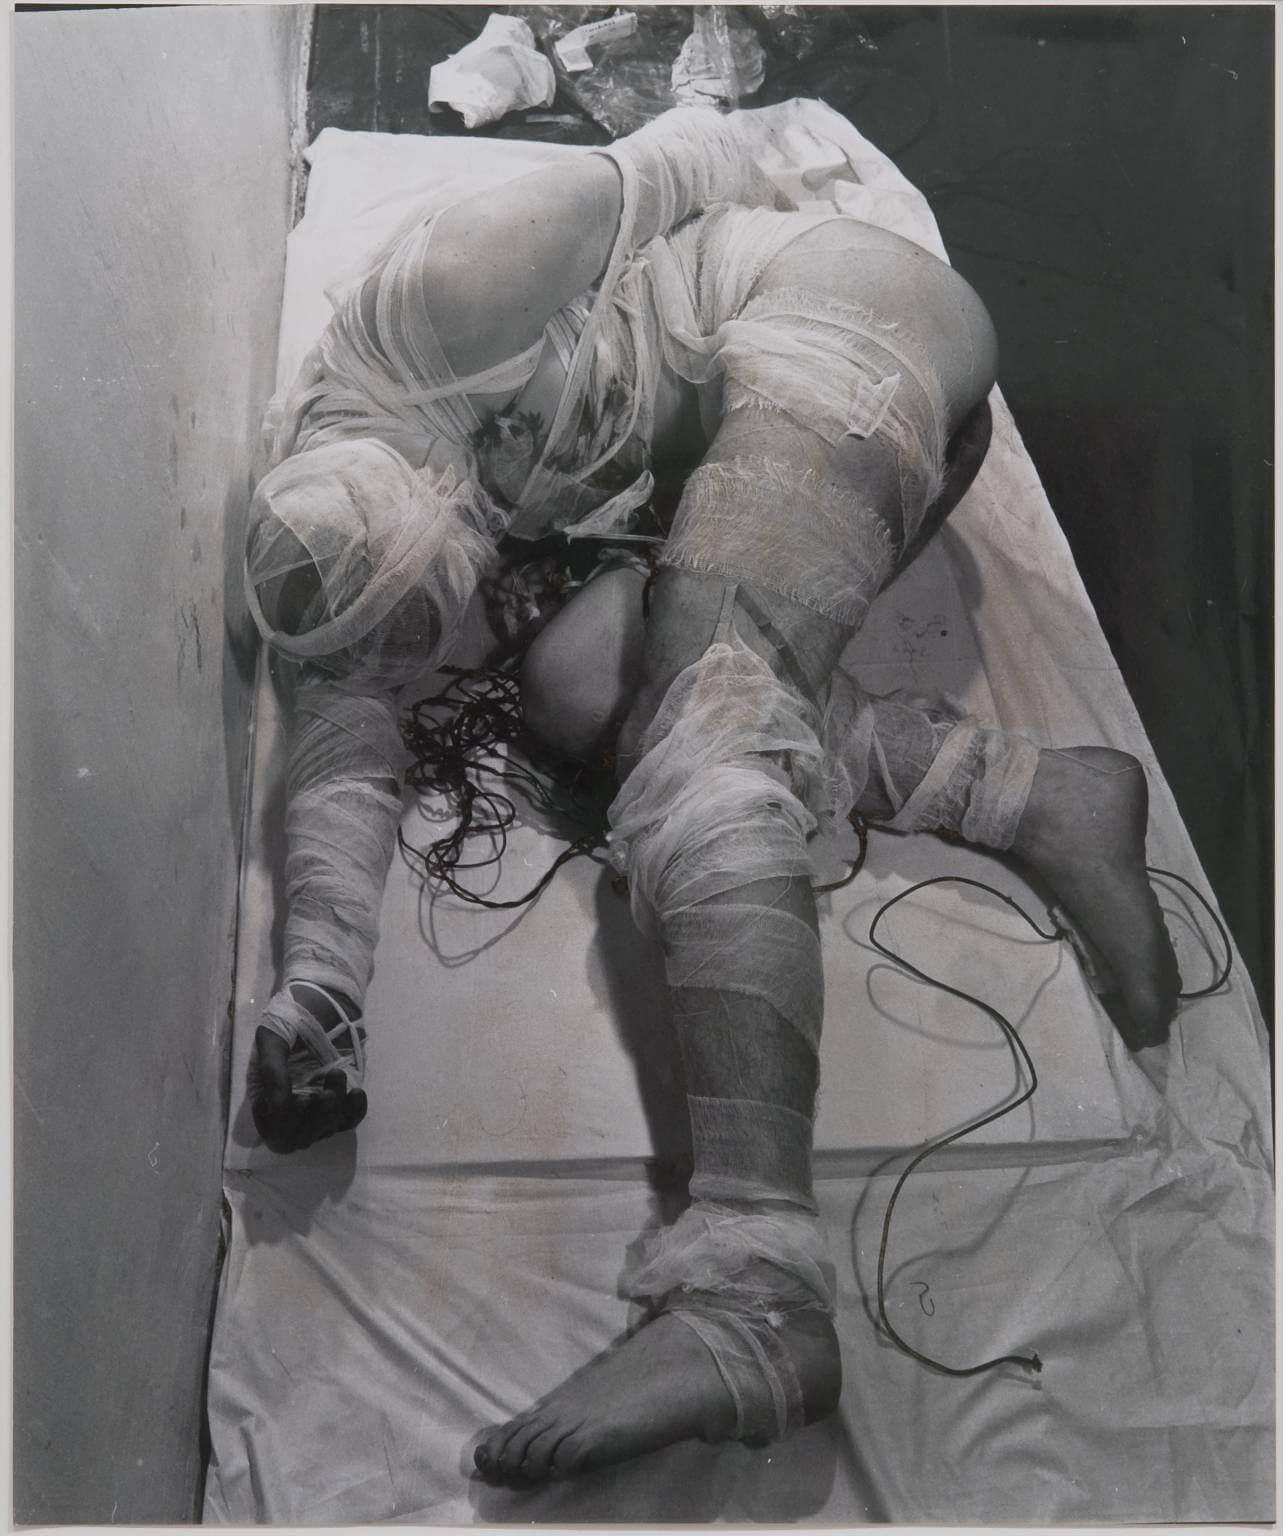 3rd Action 1965, printed early 1970s Rudolf Schwarzkogler 1940-1969 Purchased 2002 http://www.tate.org.uk/art/work/T11848